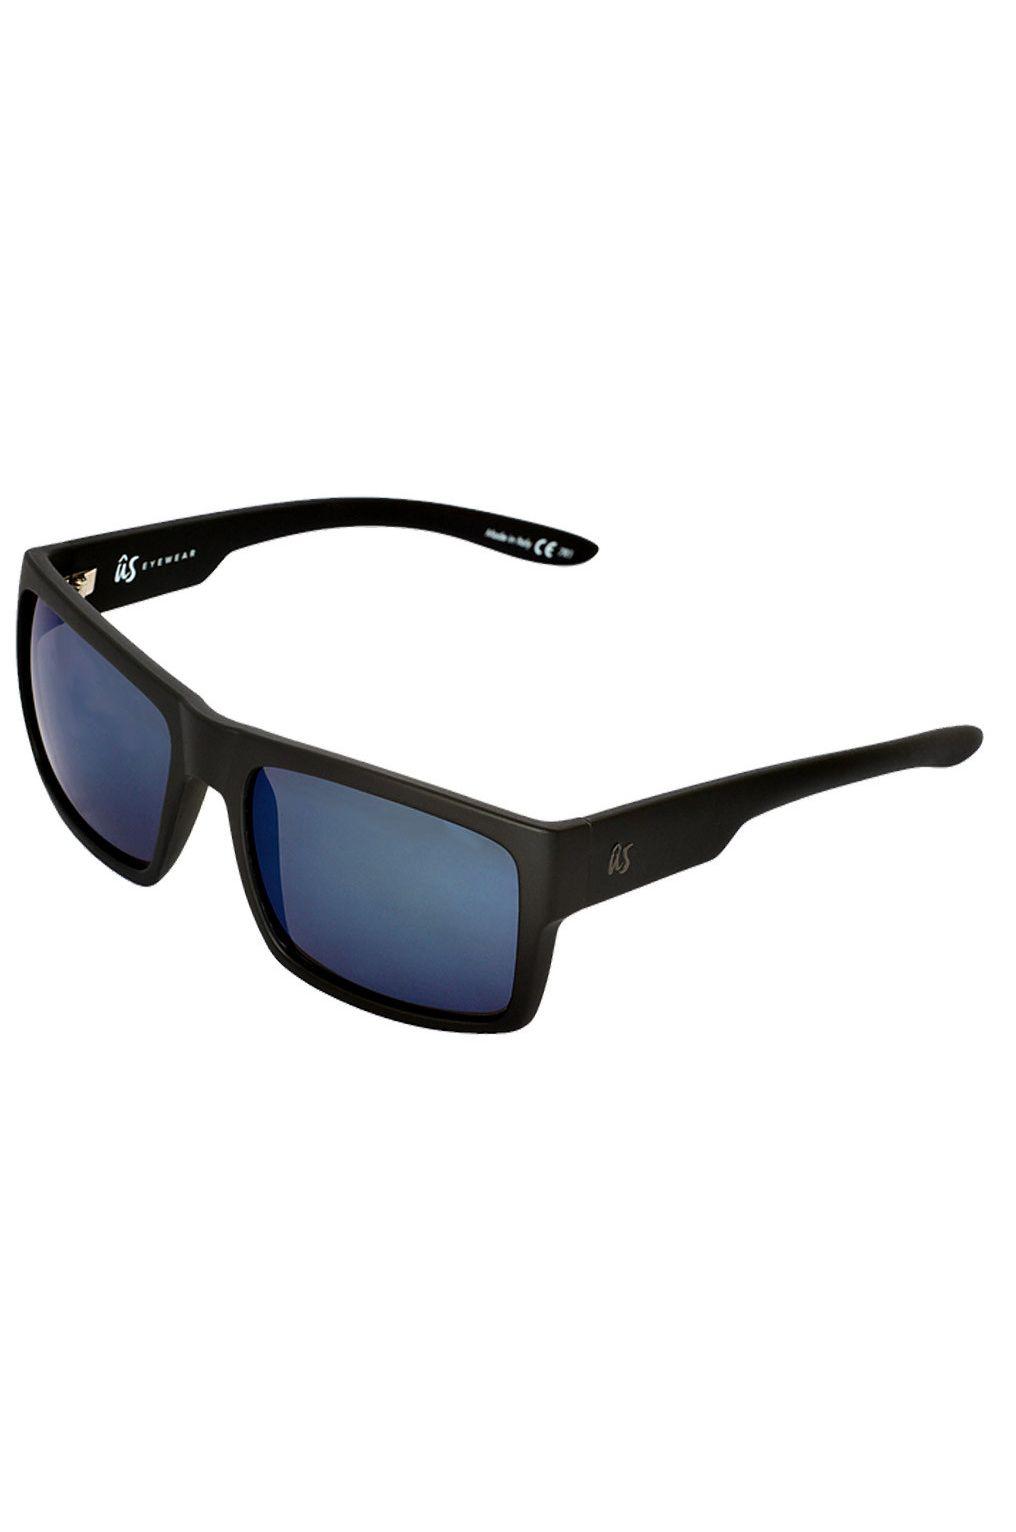 US Sunglasses HELIOS Matte Black/Grey Blue Chrome